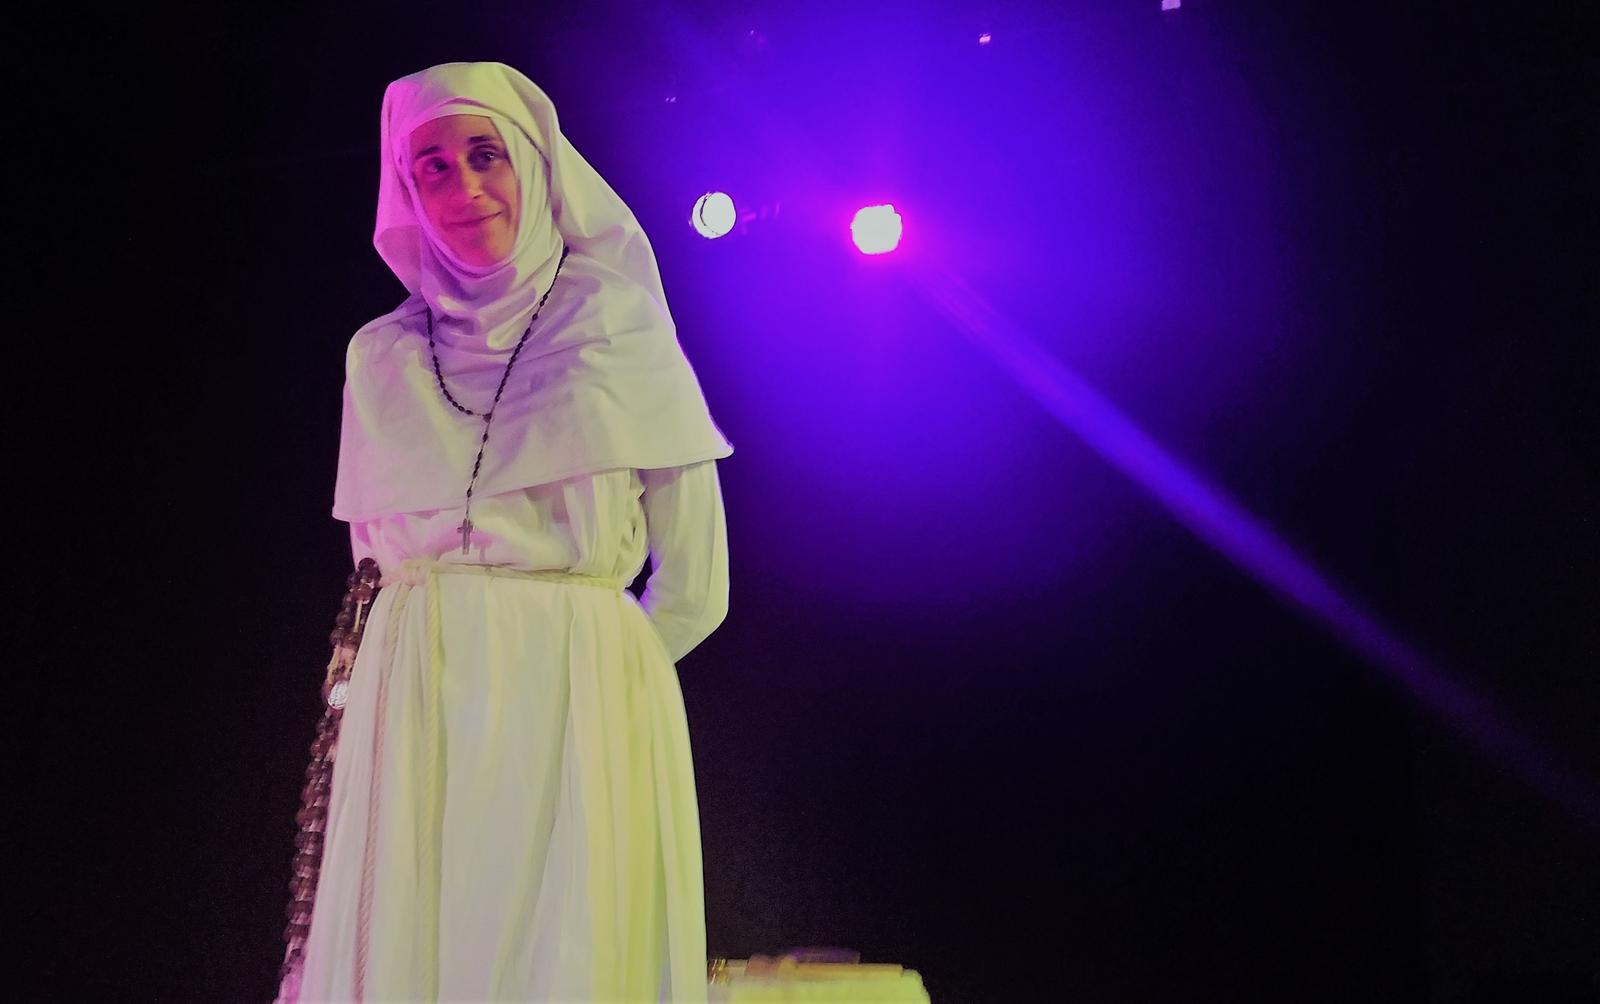 Sister Nocciolina, April 2021. Photo: Aline Hémagi Fernande.